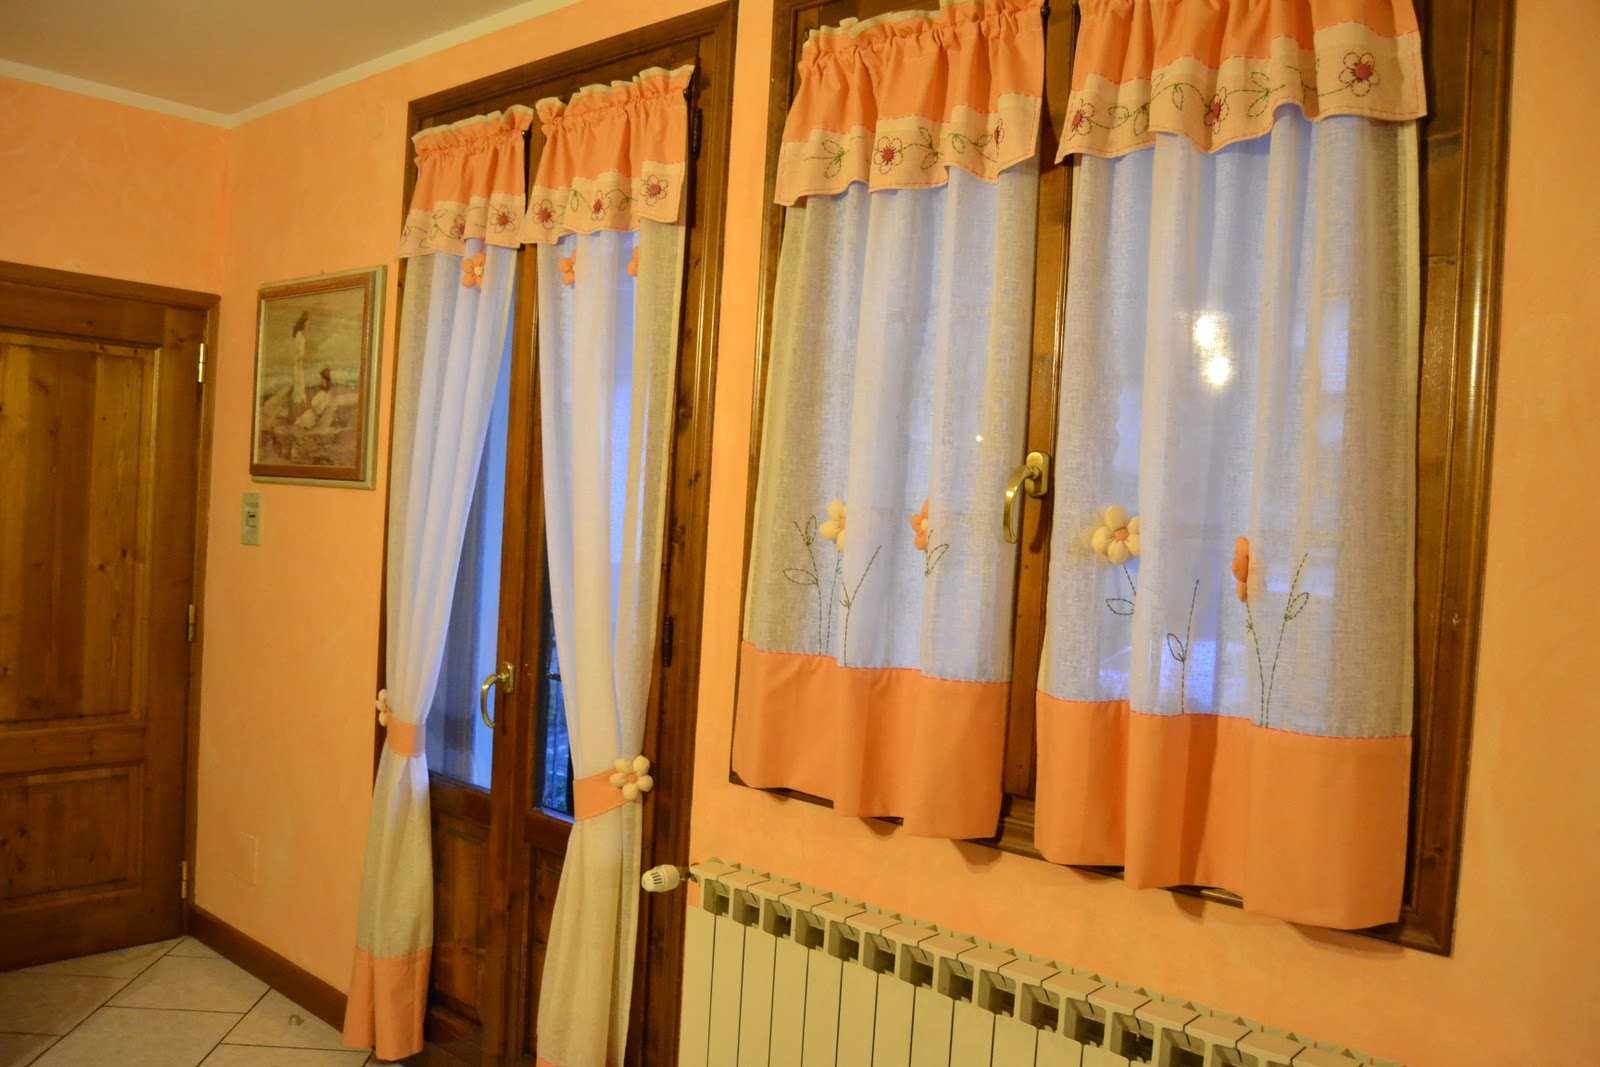 Tende Fai Da Te Shabby : Tende camera da letto coin euronova tende tende trasparenti tende